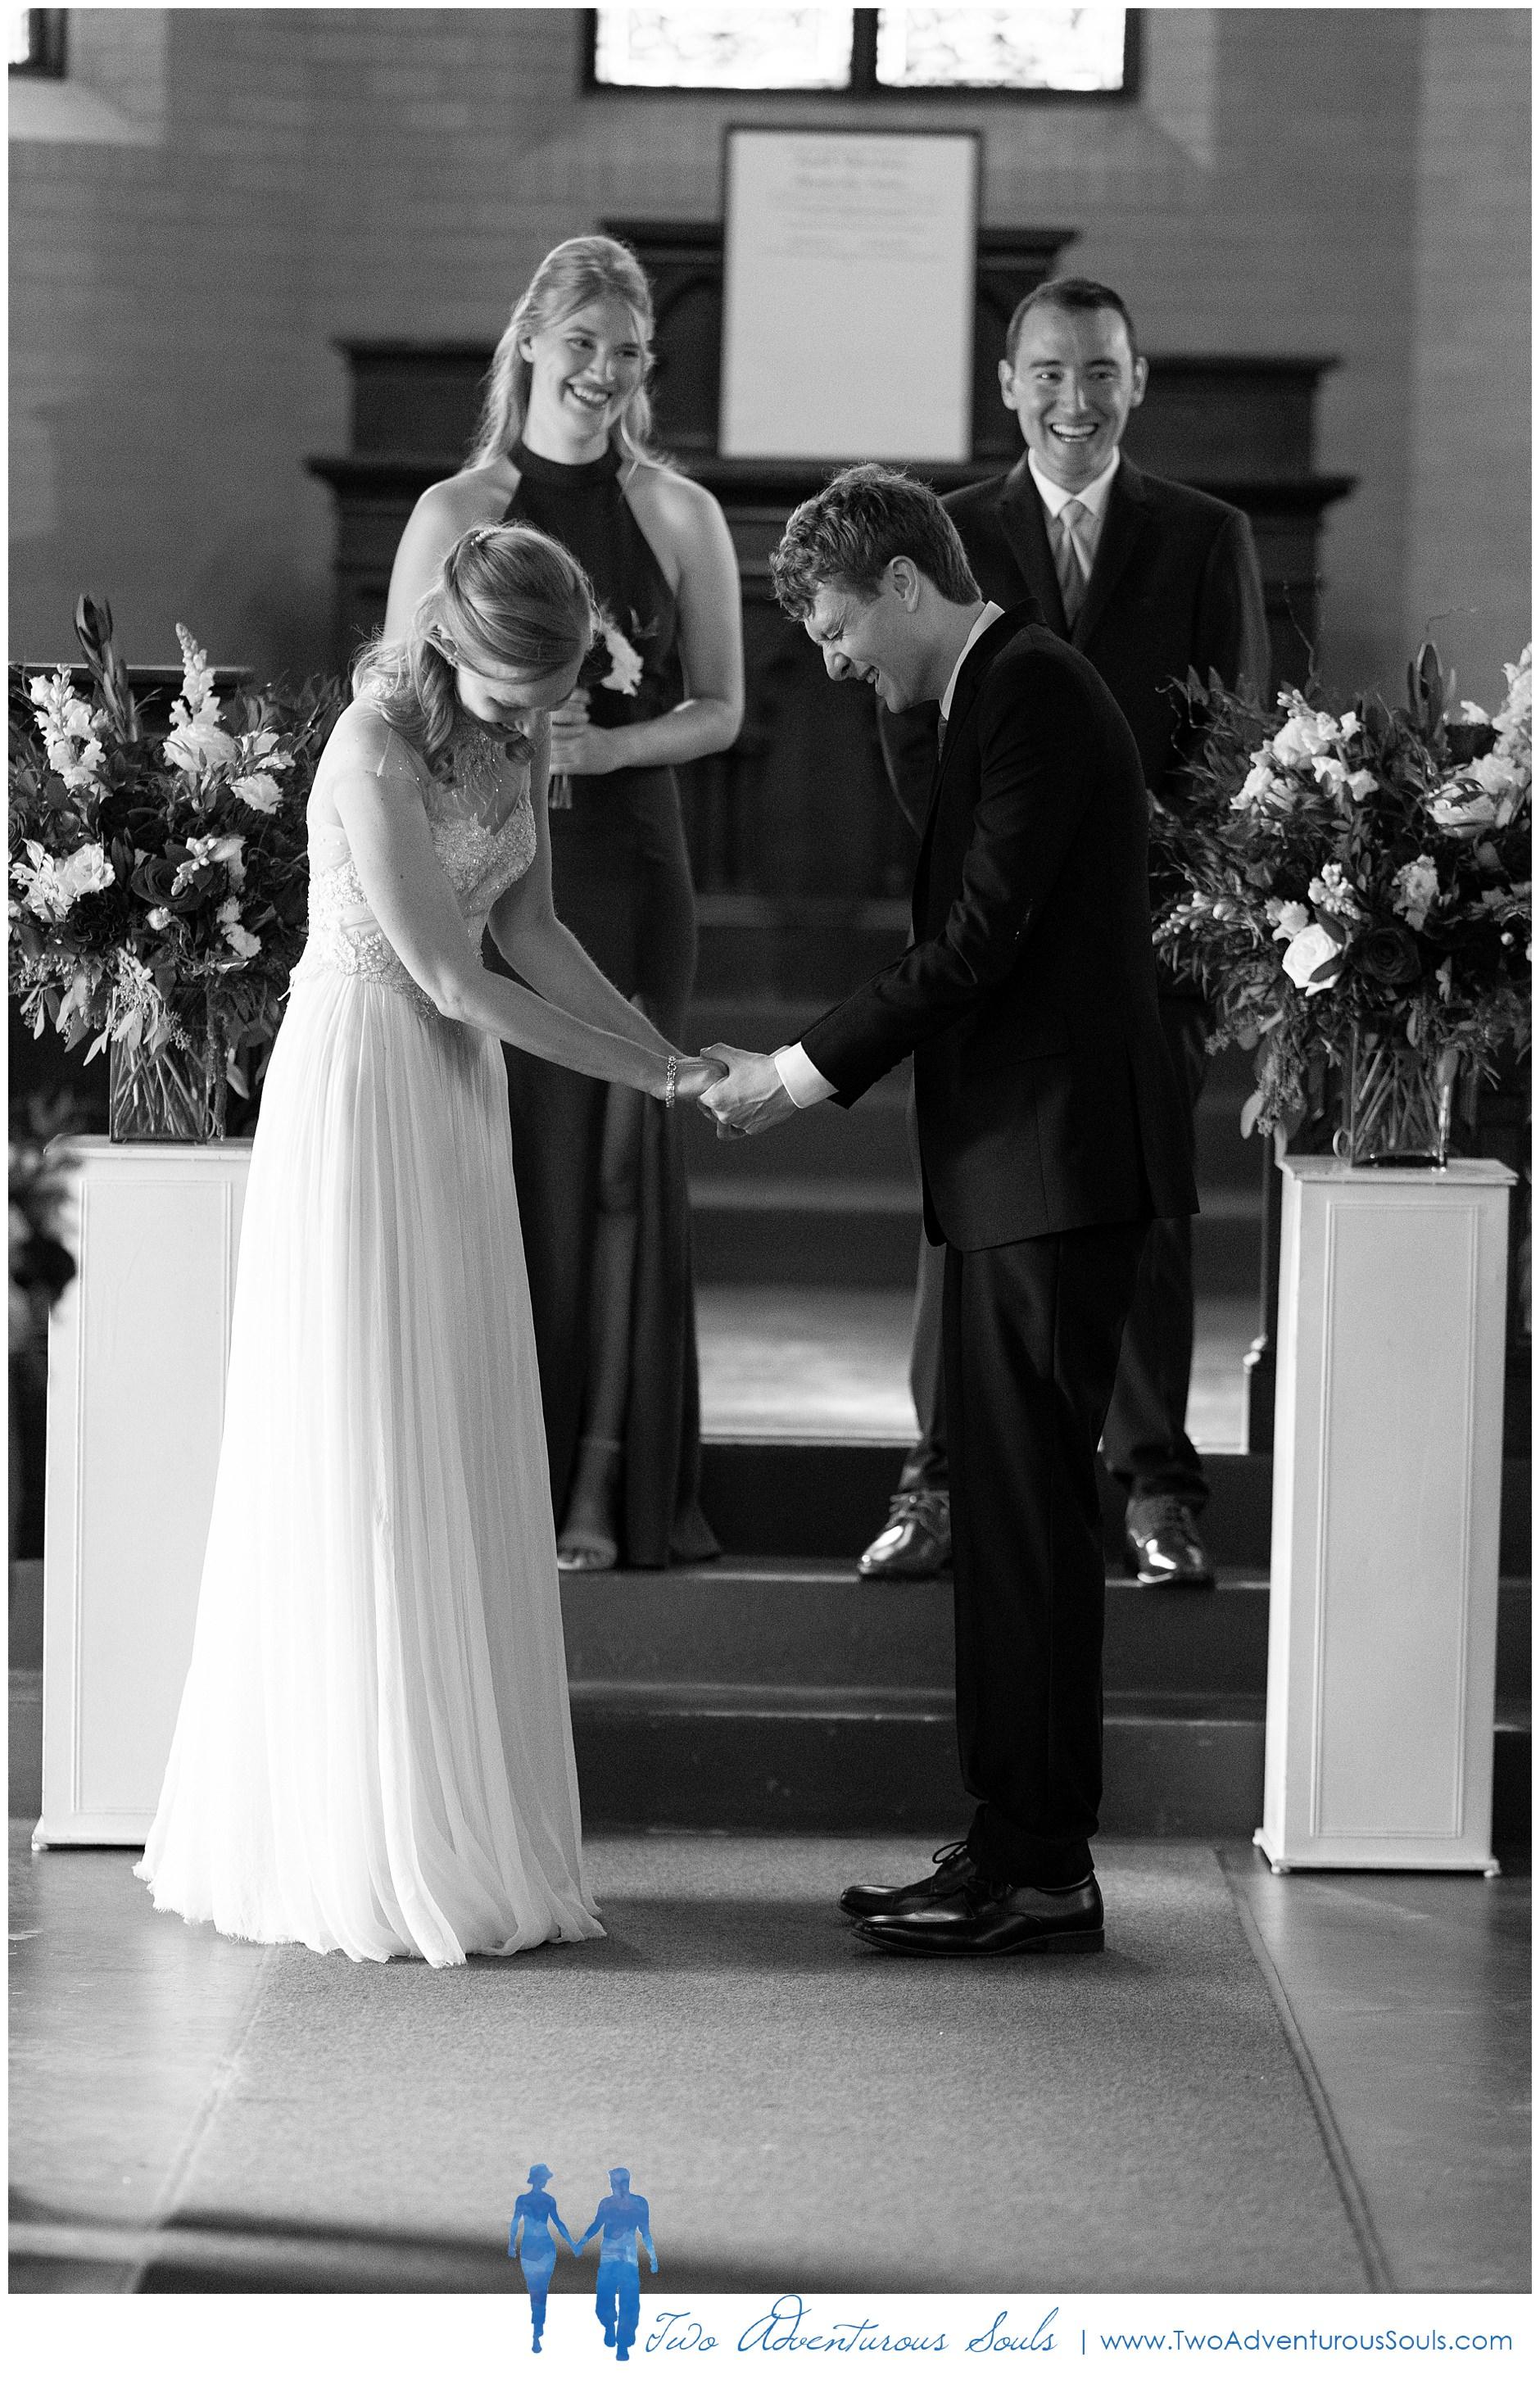 Grace Maine Photographers, Portland Maine Wedding Photographers, Two Adventurous Souls- 090719_0022.jpg